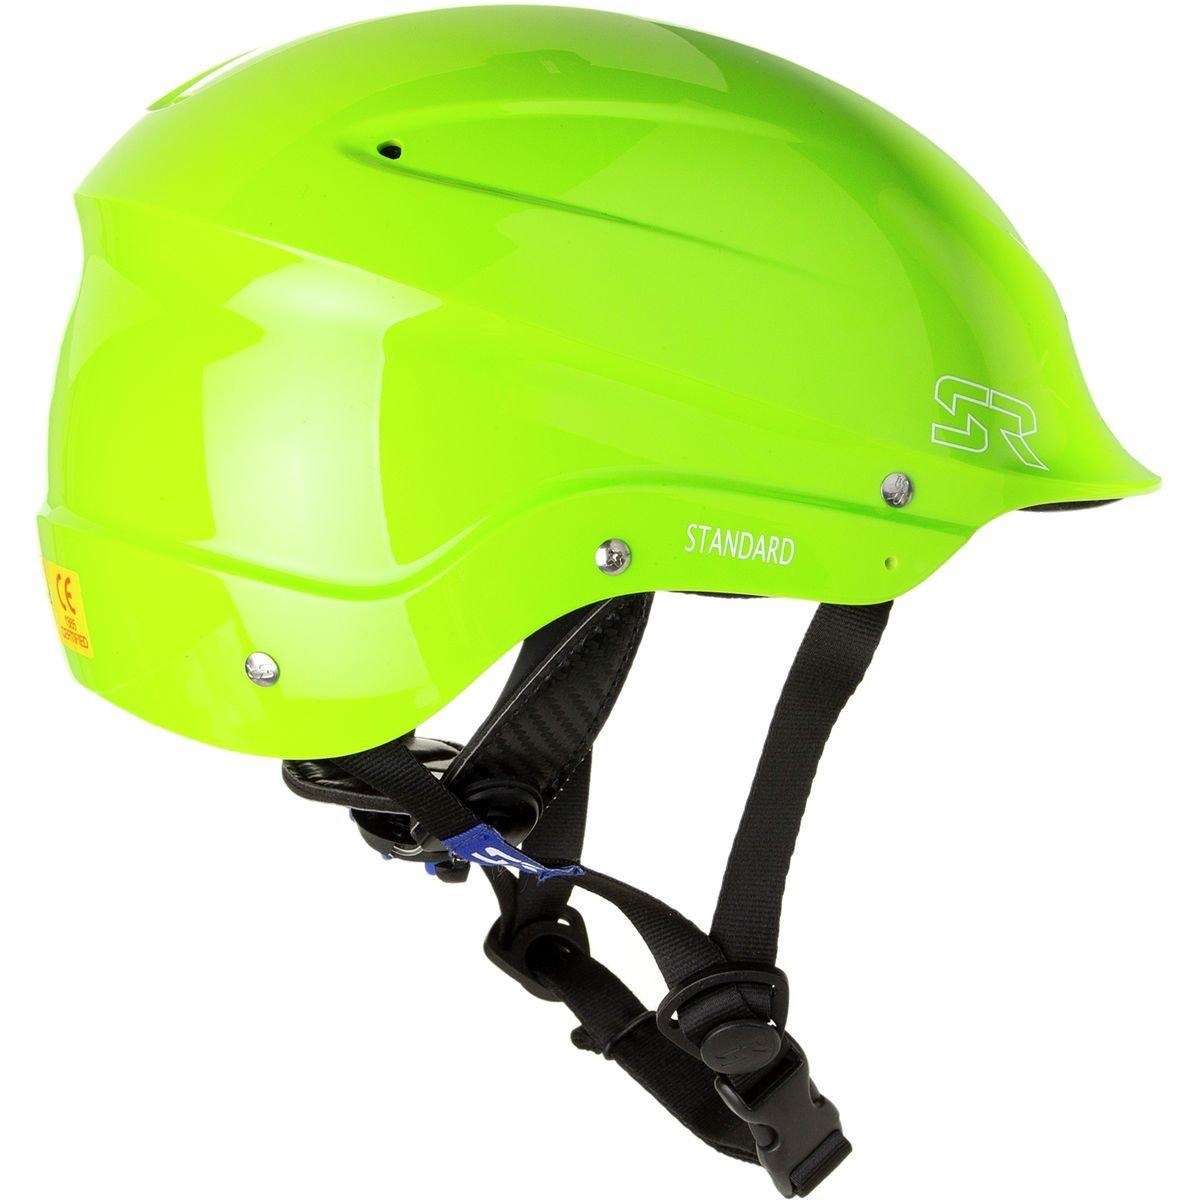 Shred Ready Standard Halfcut Helmet